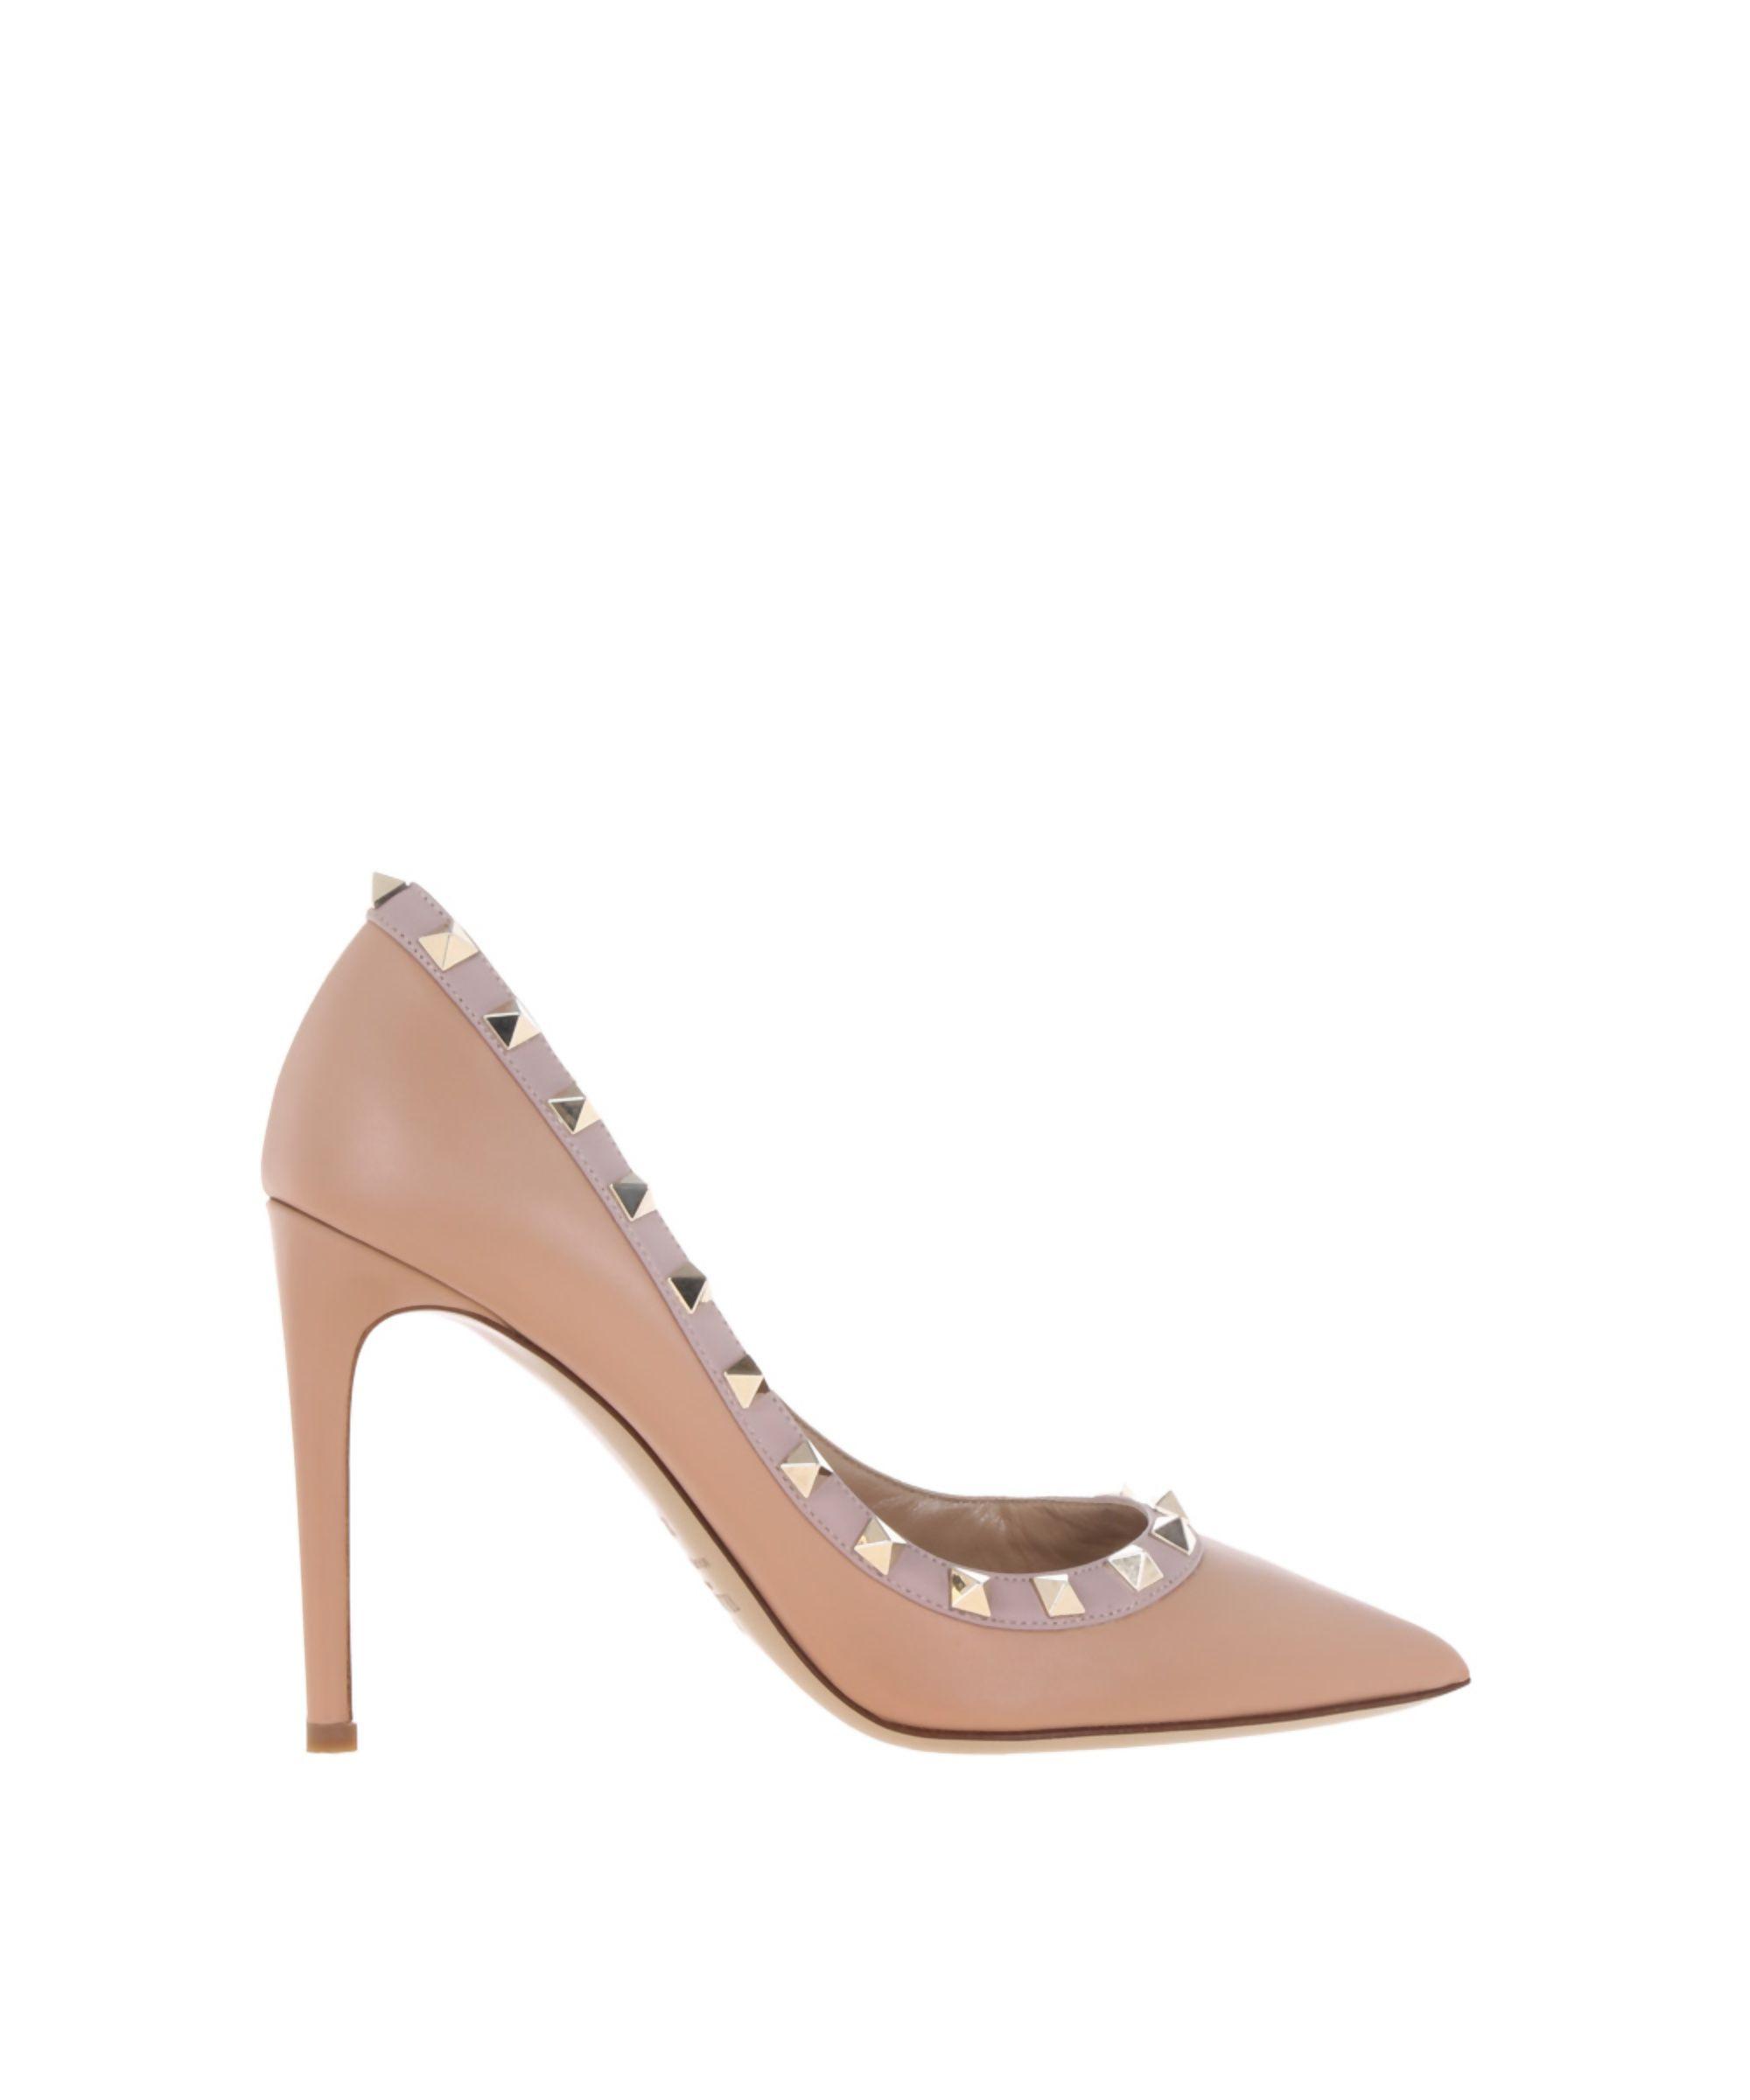 VALENTINO | Valentino Garavani Women's Pink Leather Pumps #Shoes #Pumps &  High Heels #